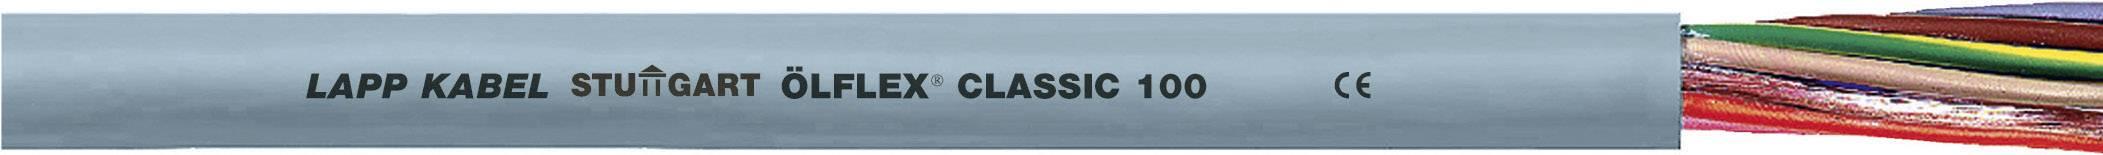 Kabel LappKabel Ölflex CLASSIC 100 4G0,5 (00100024), PVC, 5,7 mm, 500 V, šedá, 1000 m